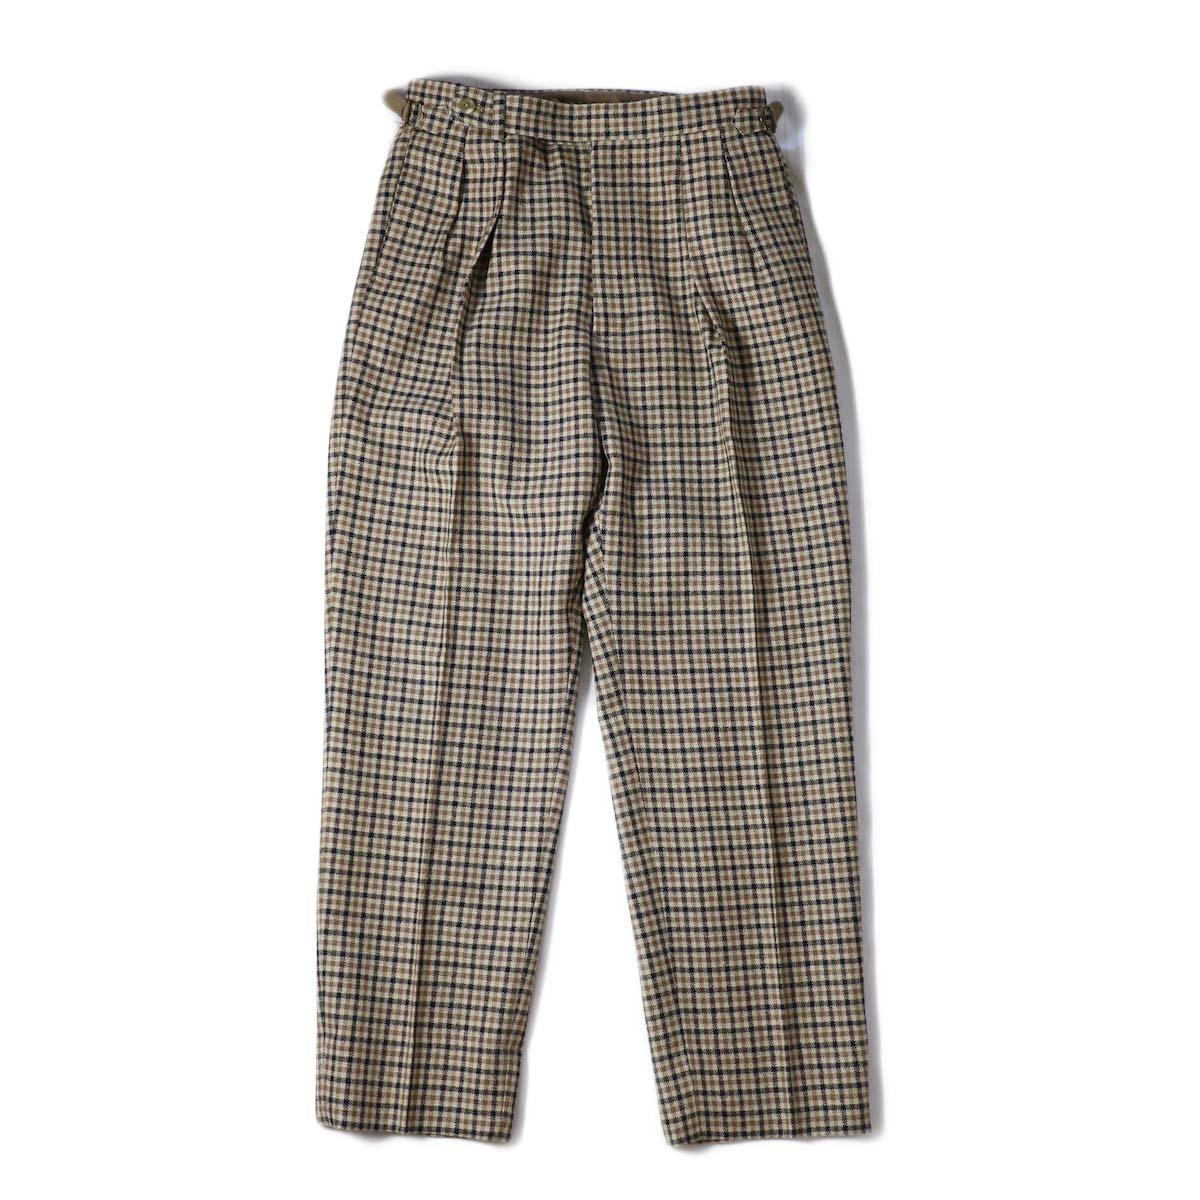 Kaptain Sunshine / Two Pleats Trousers